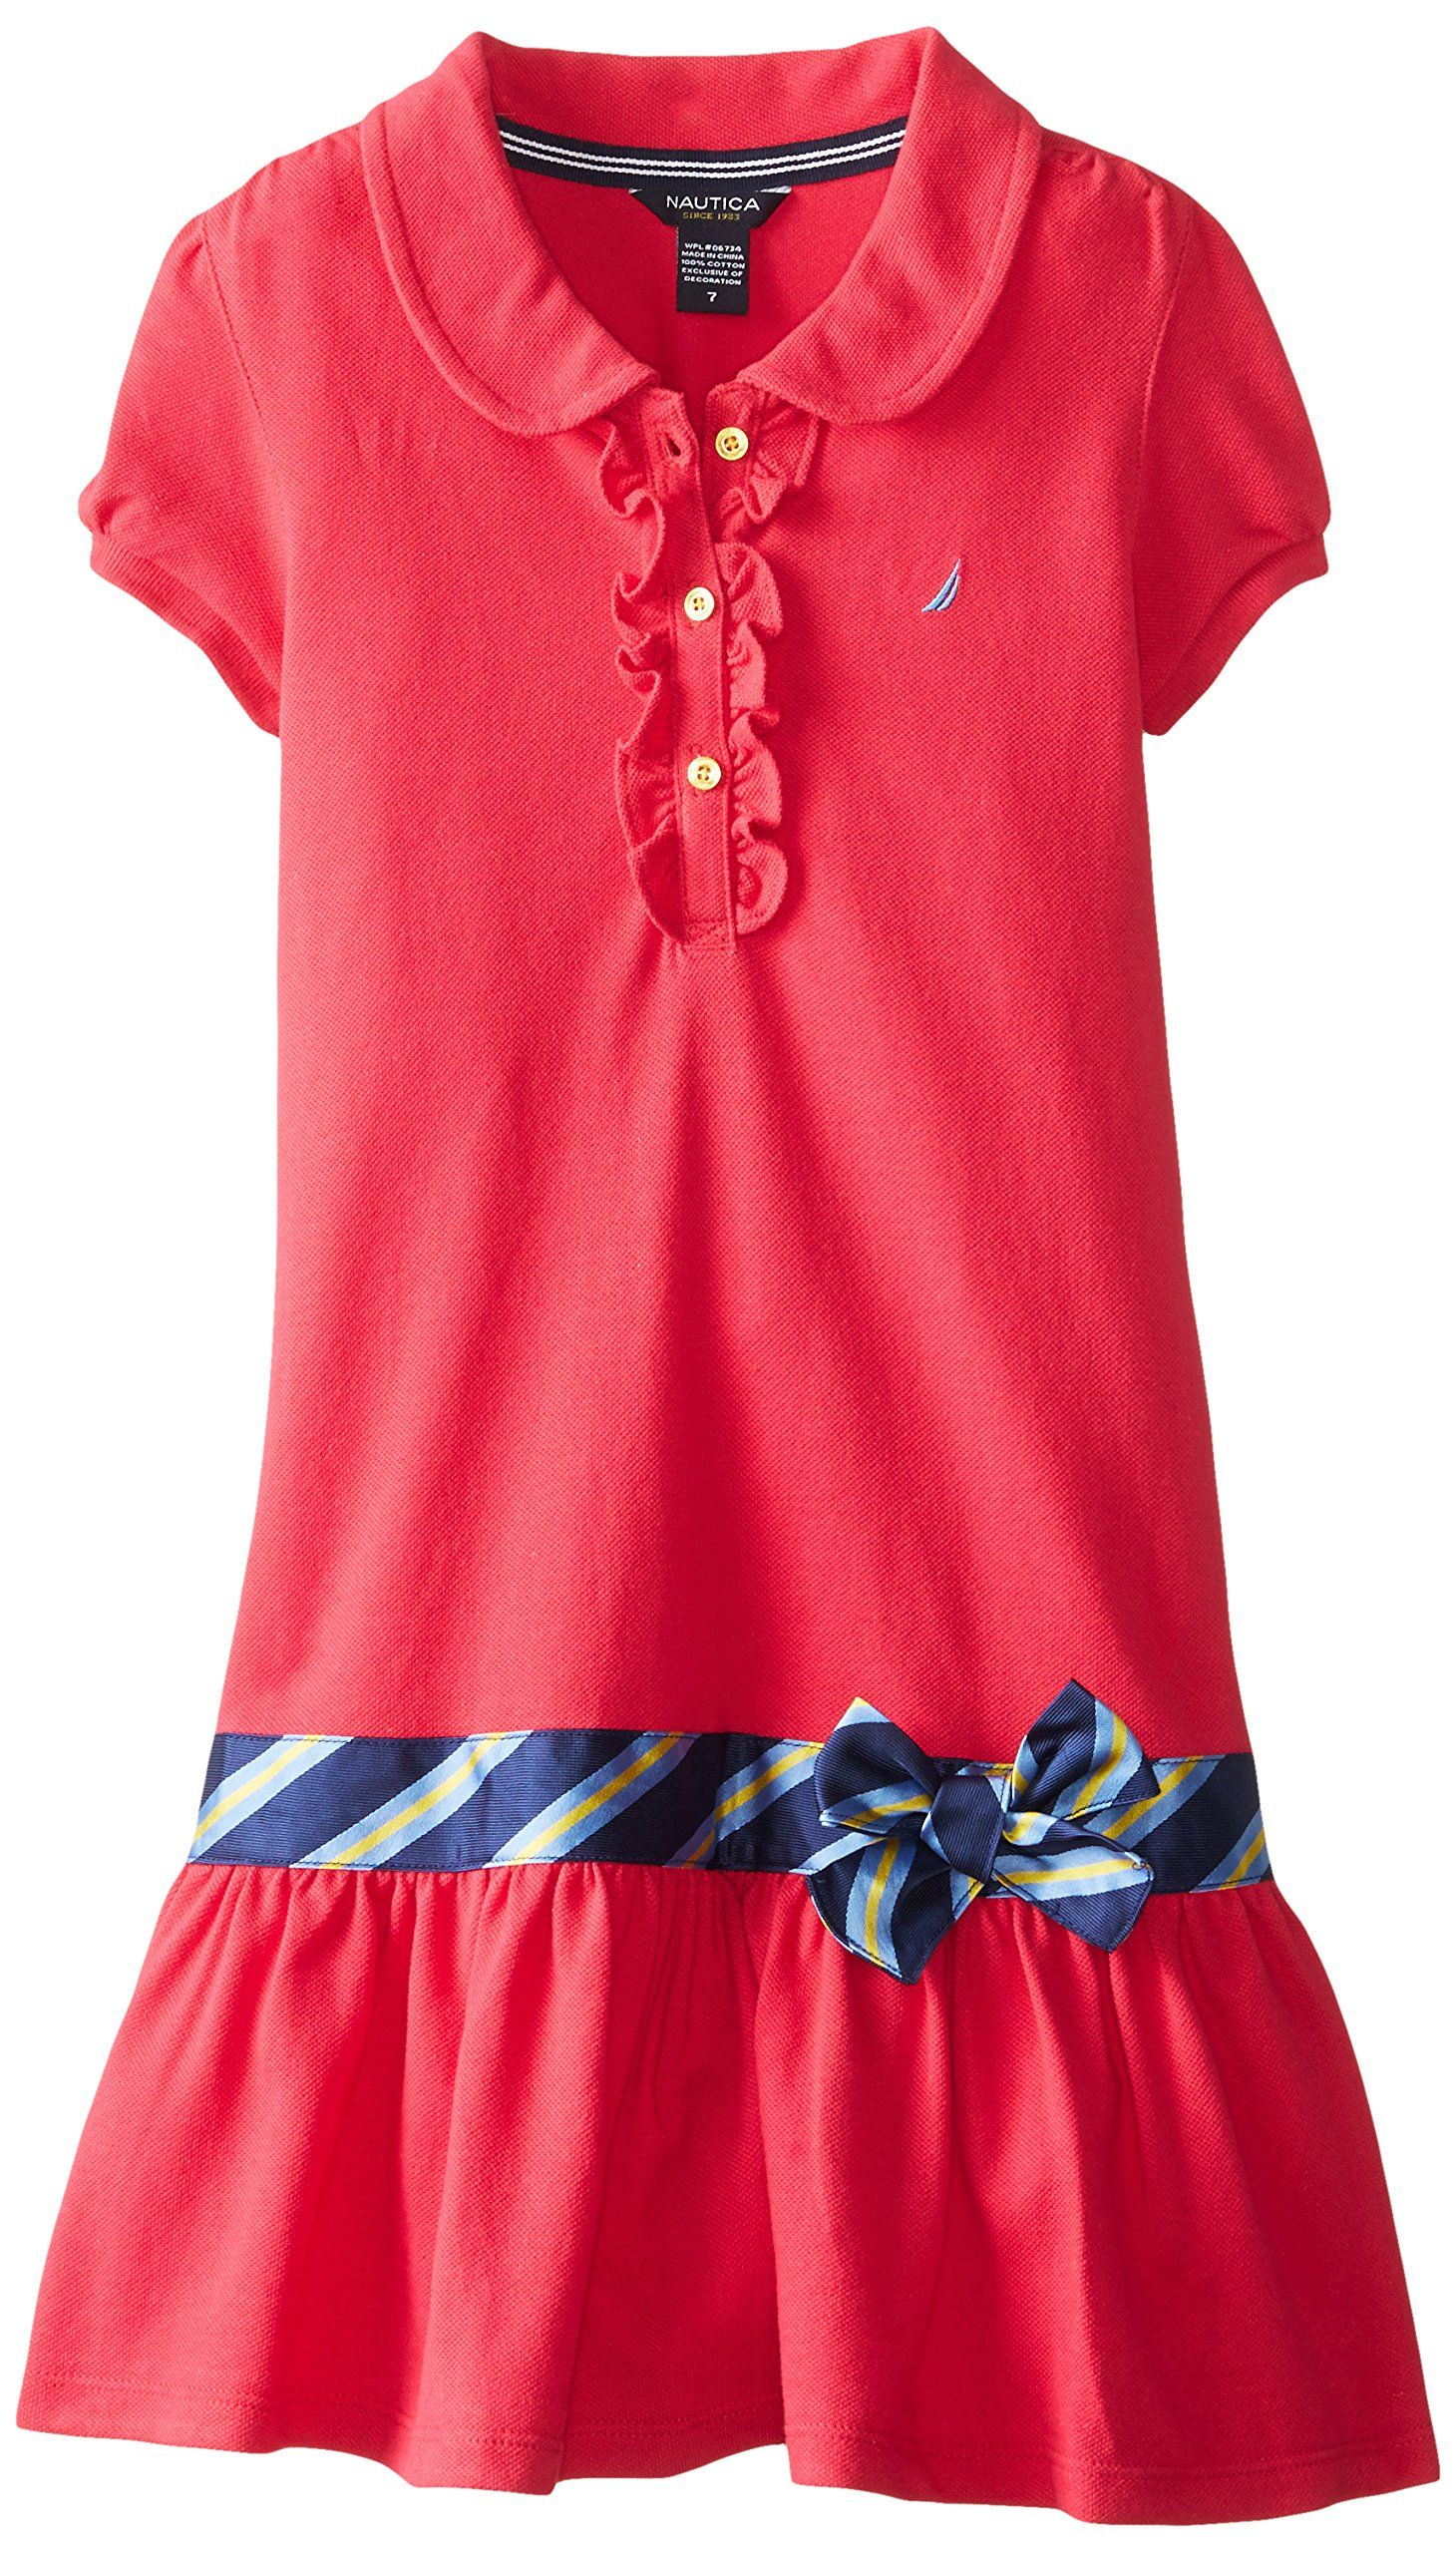 Nautica Big Girls Pique Polo Dress with Gold Buttons Medium Pink